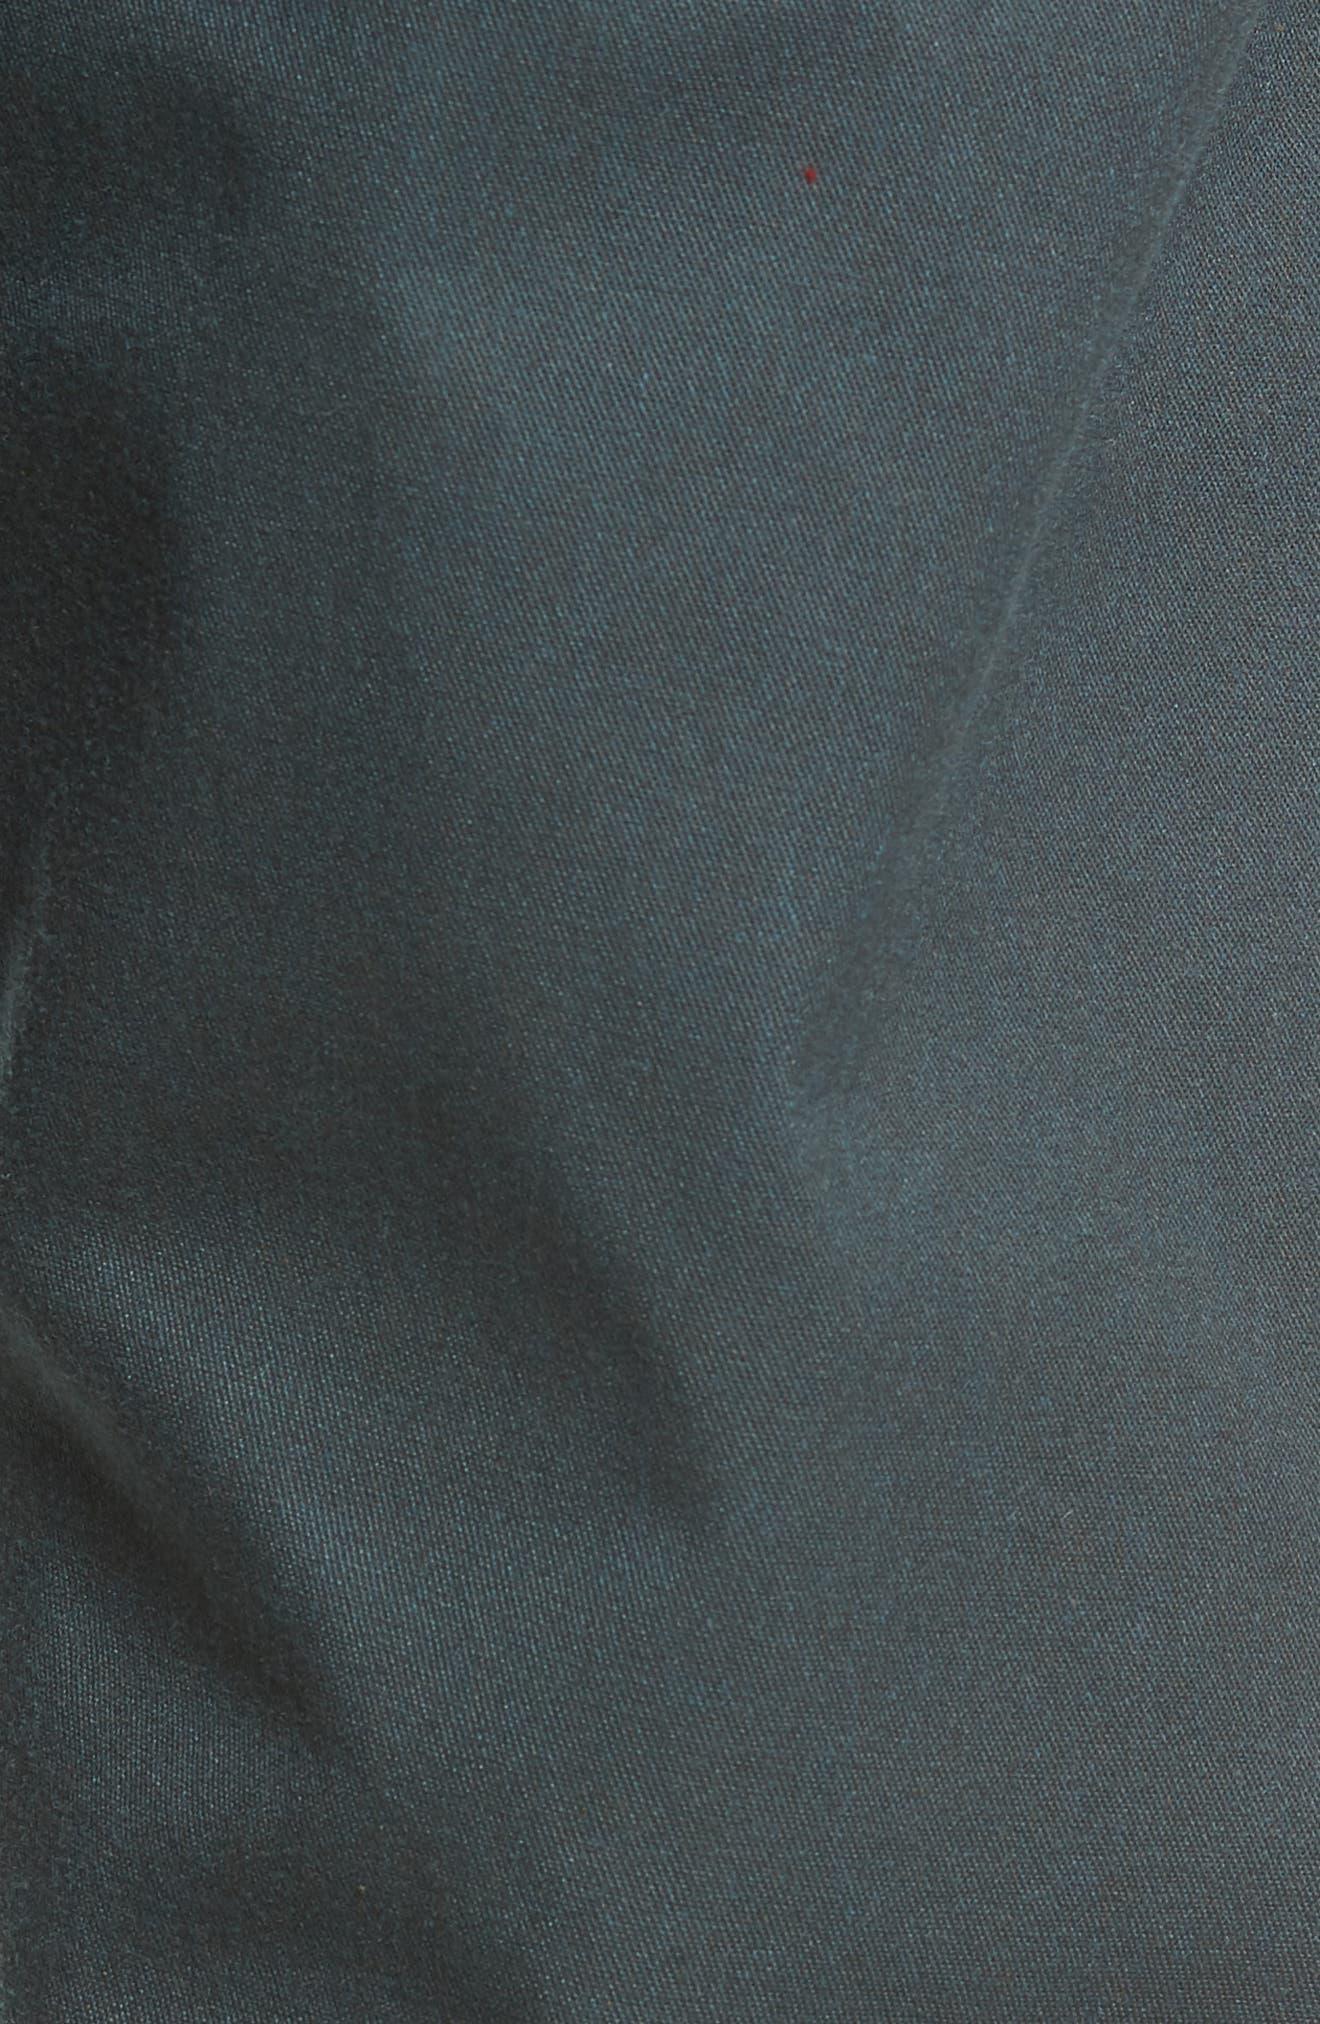 Authentic Chino Pro Pants,                             Alternate thumbnail 5, color,                             300